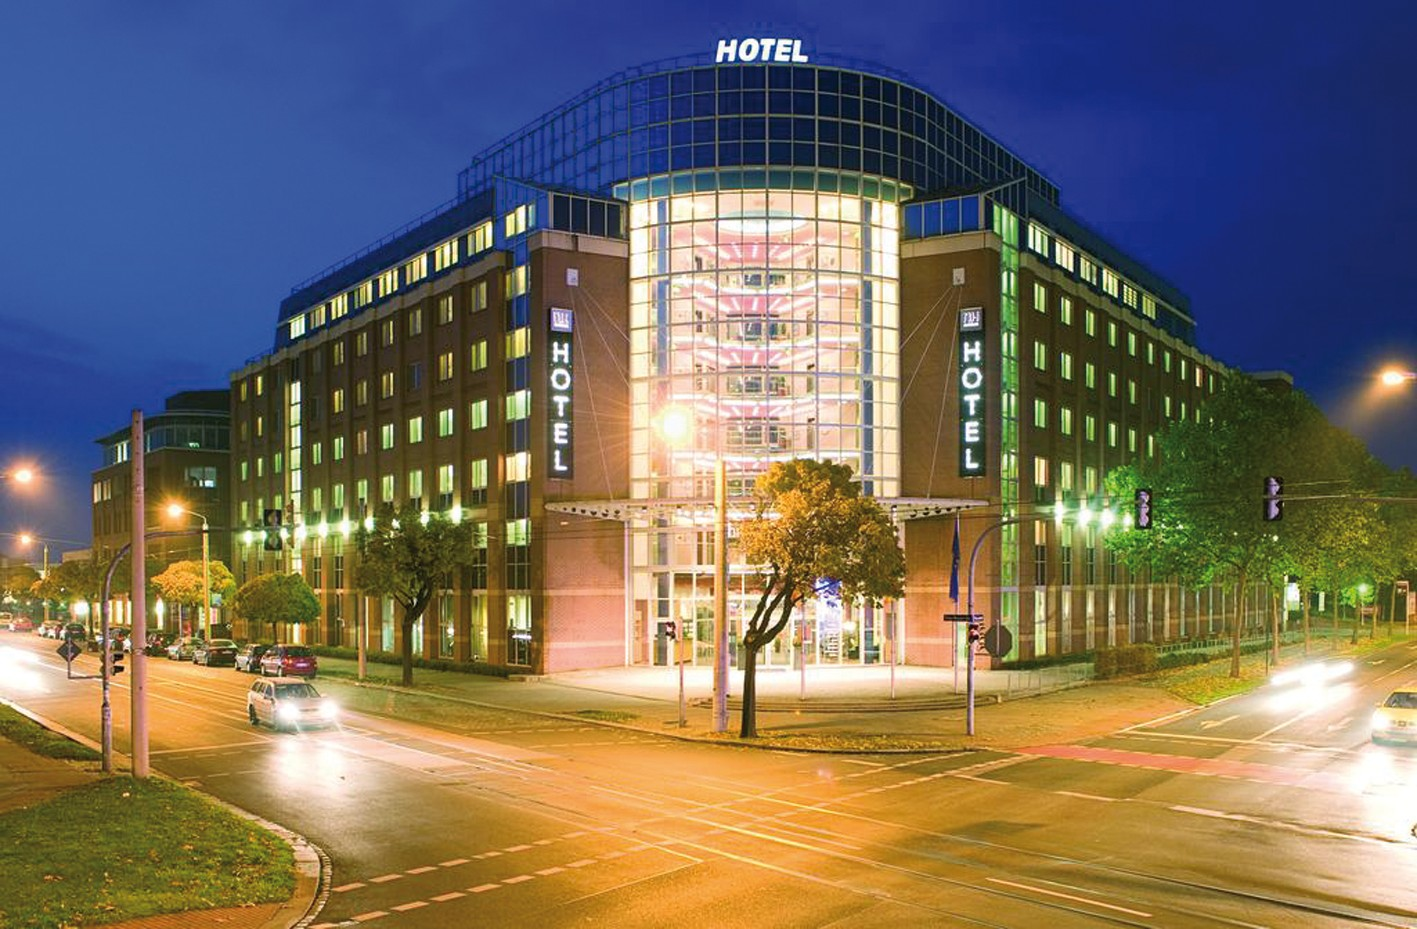 Minibar Kühlschrank Hotel : Frühling rabatt zu bleiben entspannung hotel hills stara lesna